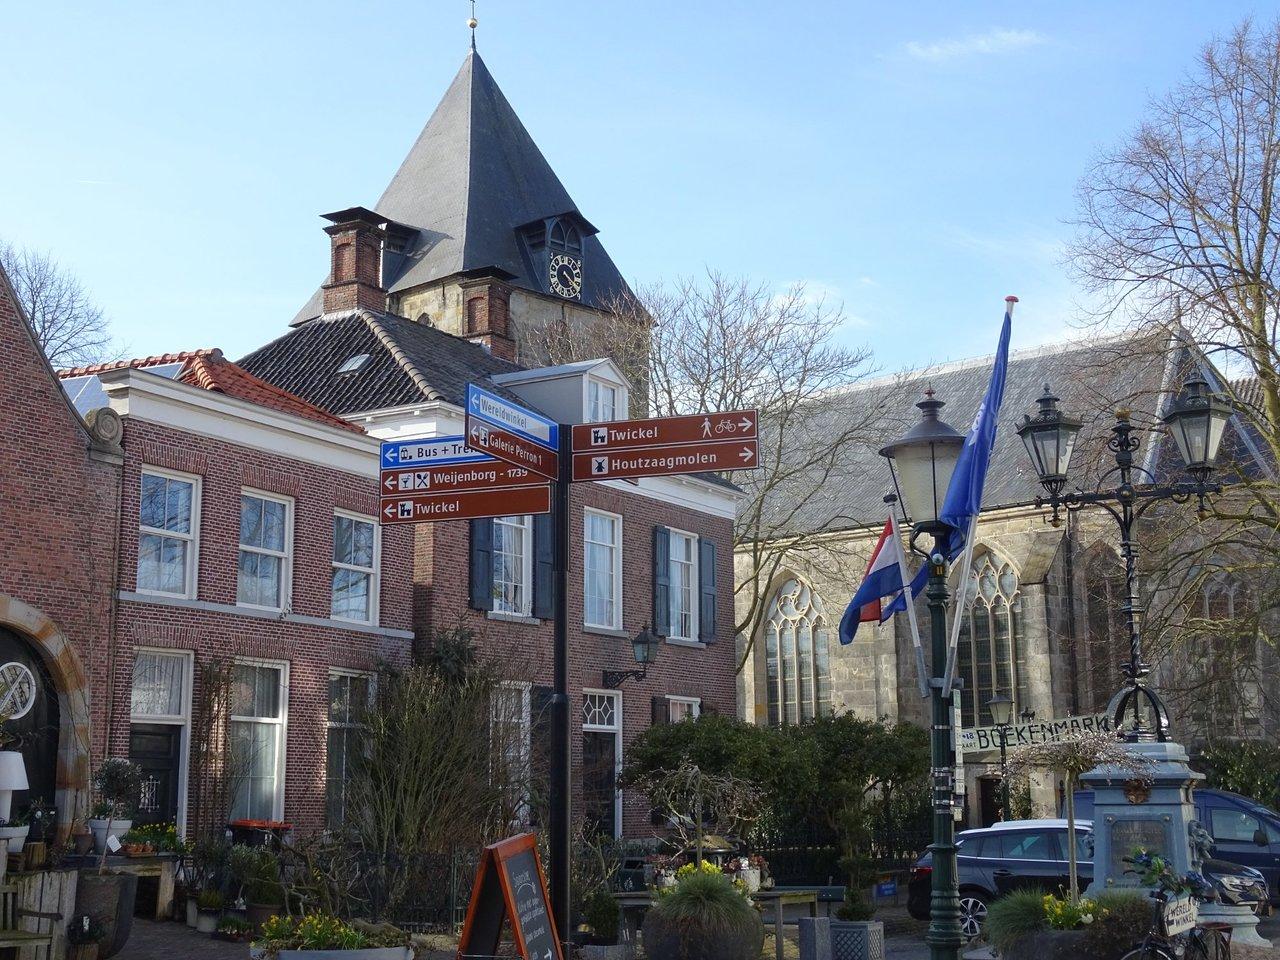 Vvv Hof Van Twente Delden 2021 All You Need To Know Before You Go With Photos Tripadvisor